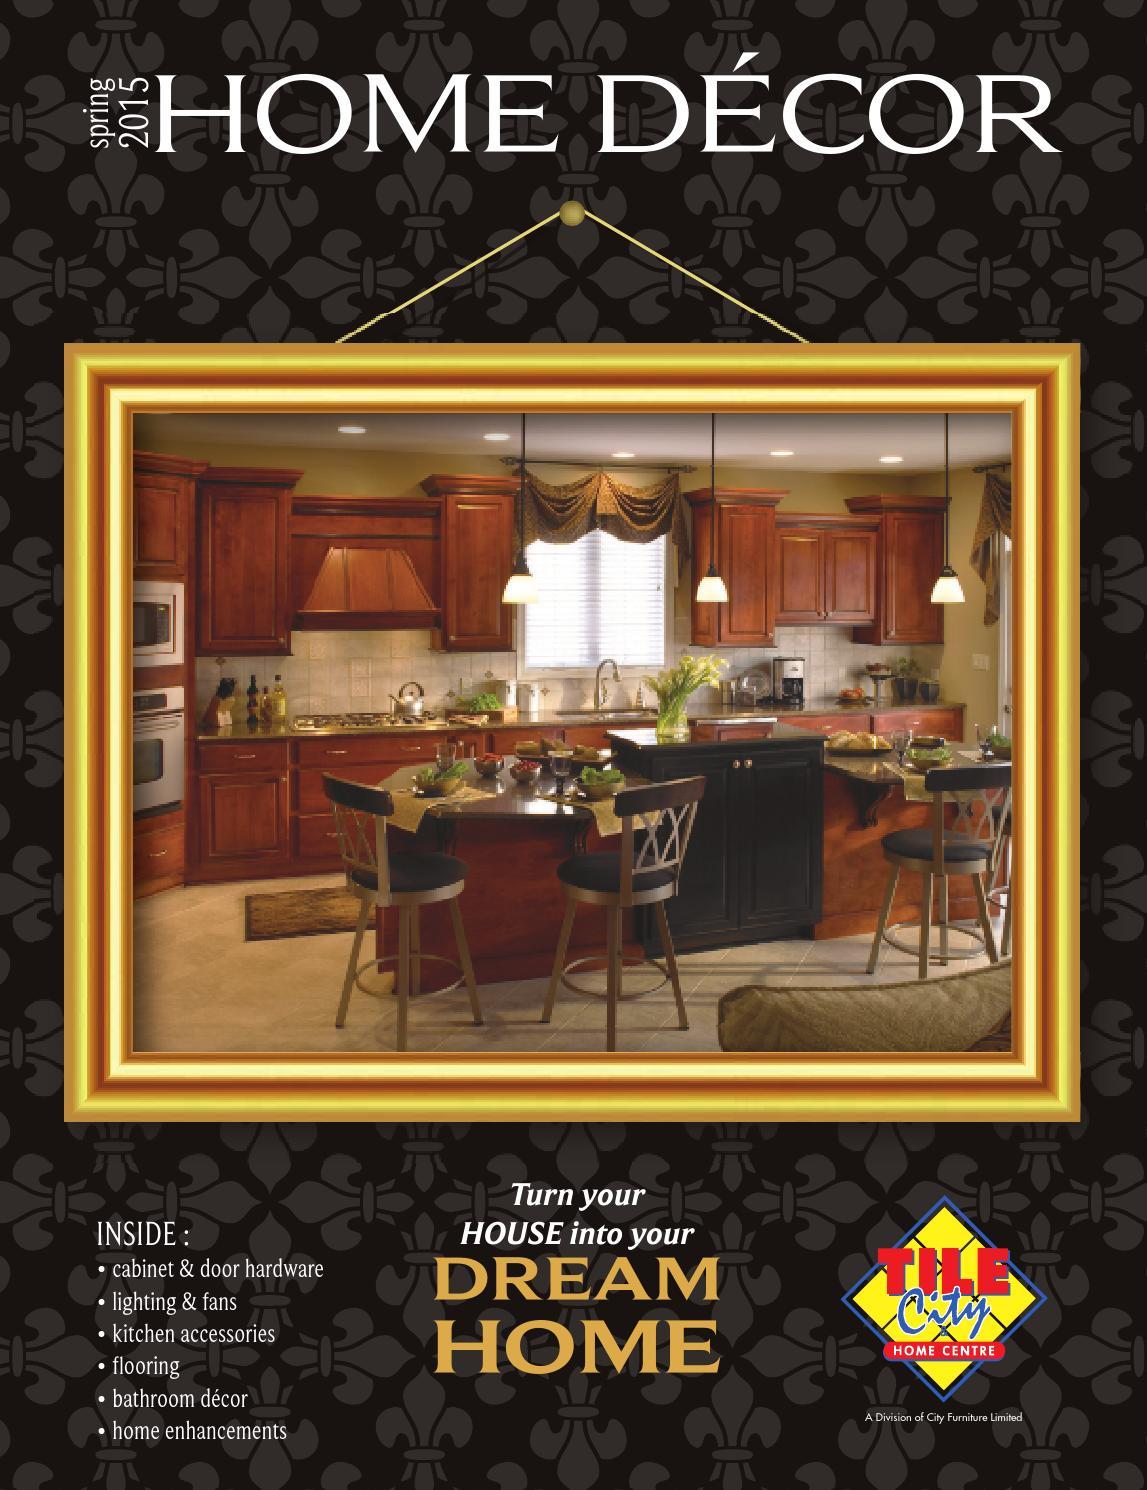 Tile City Home Centre Spring 2015 Home Decor By Tile Home Decorators Catalog Best Ideas of Home Decor and Design [homedecoratorscatalog.us]